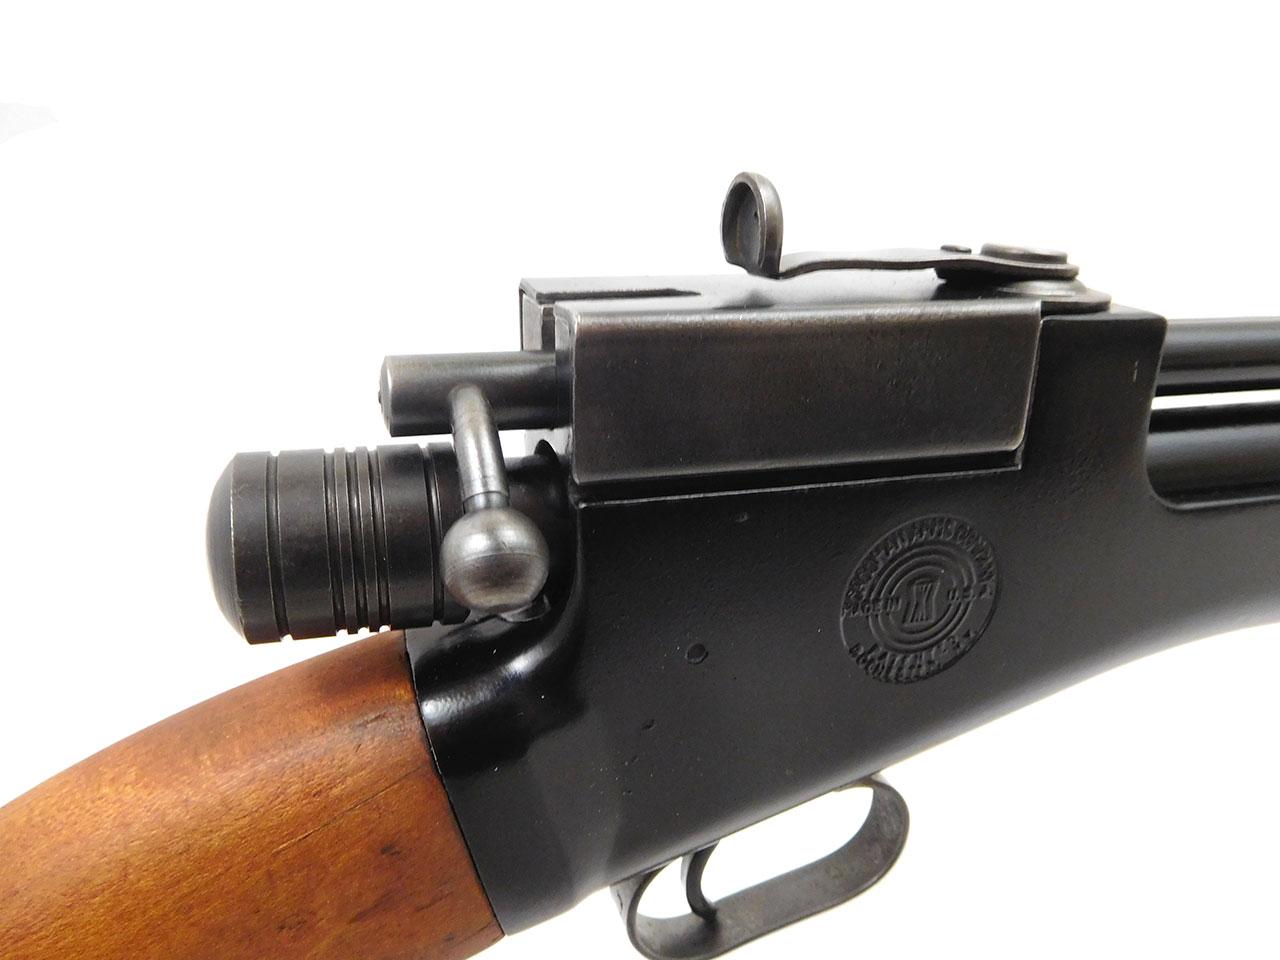 Crosman Model 104 Pellet Rifle